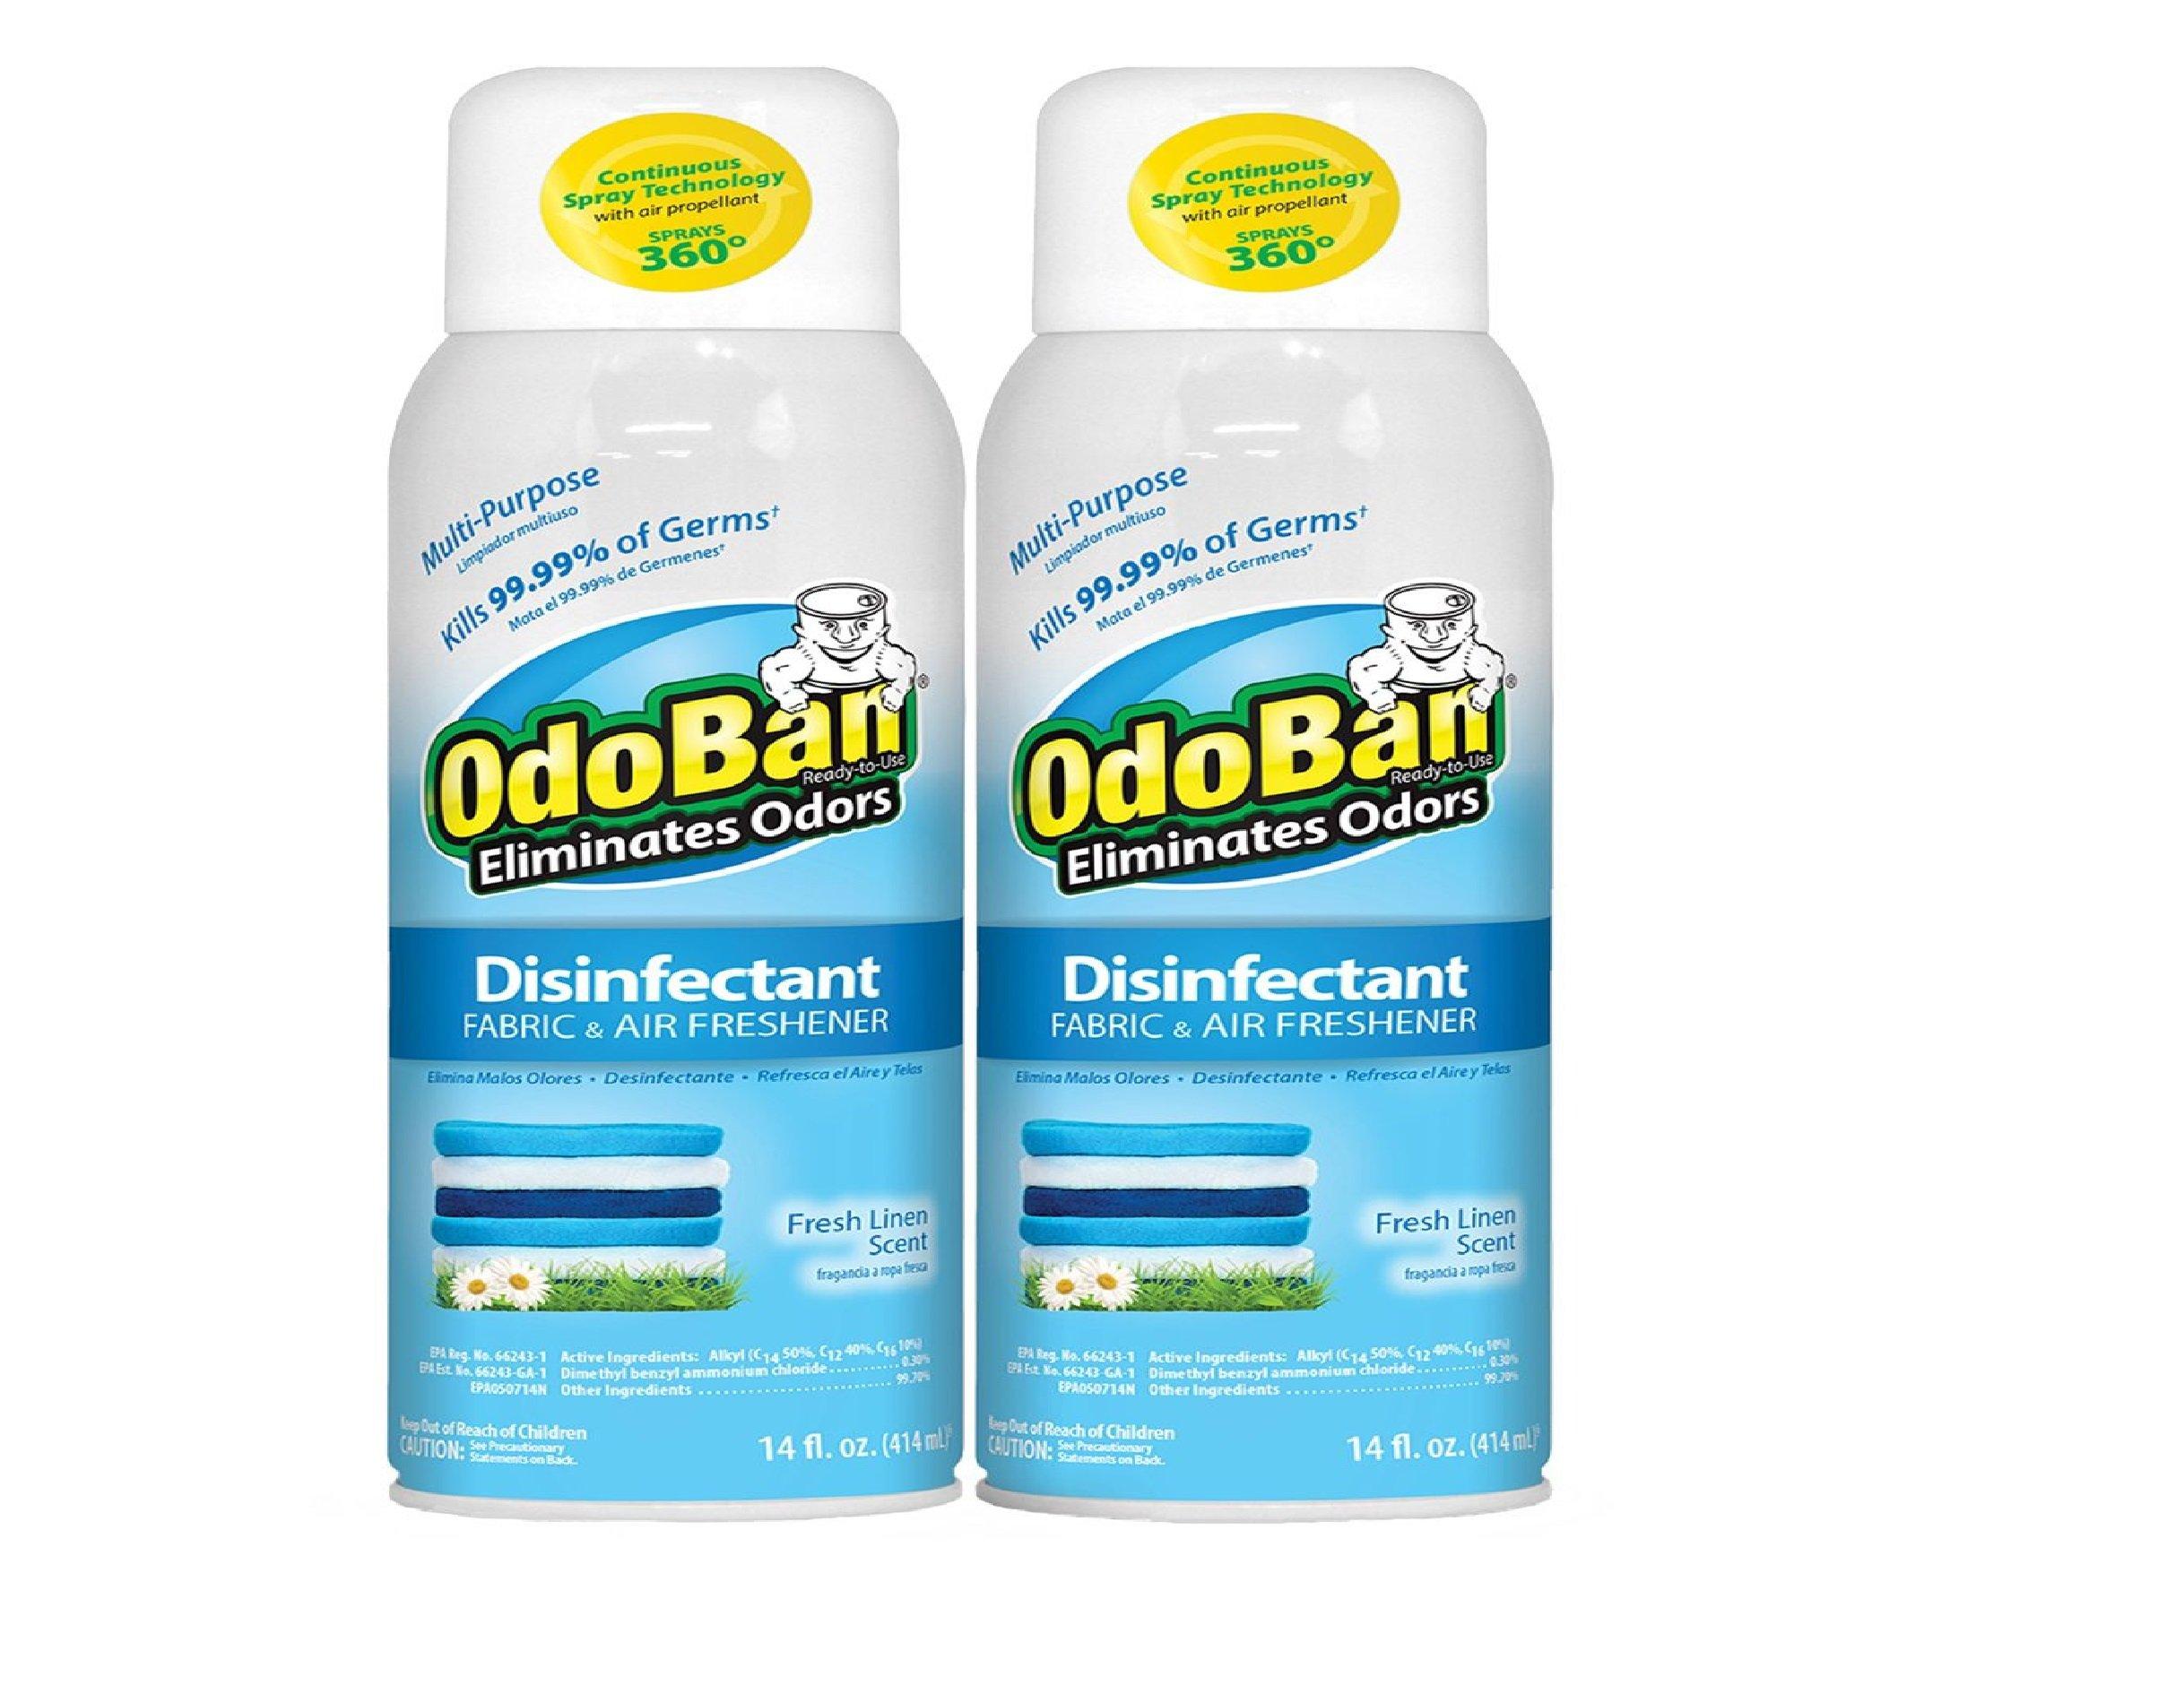 Odoban Disinfectant Fabric & Air Freshener Spray Fresh Linen Scent (14oz 2pk)